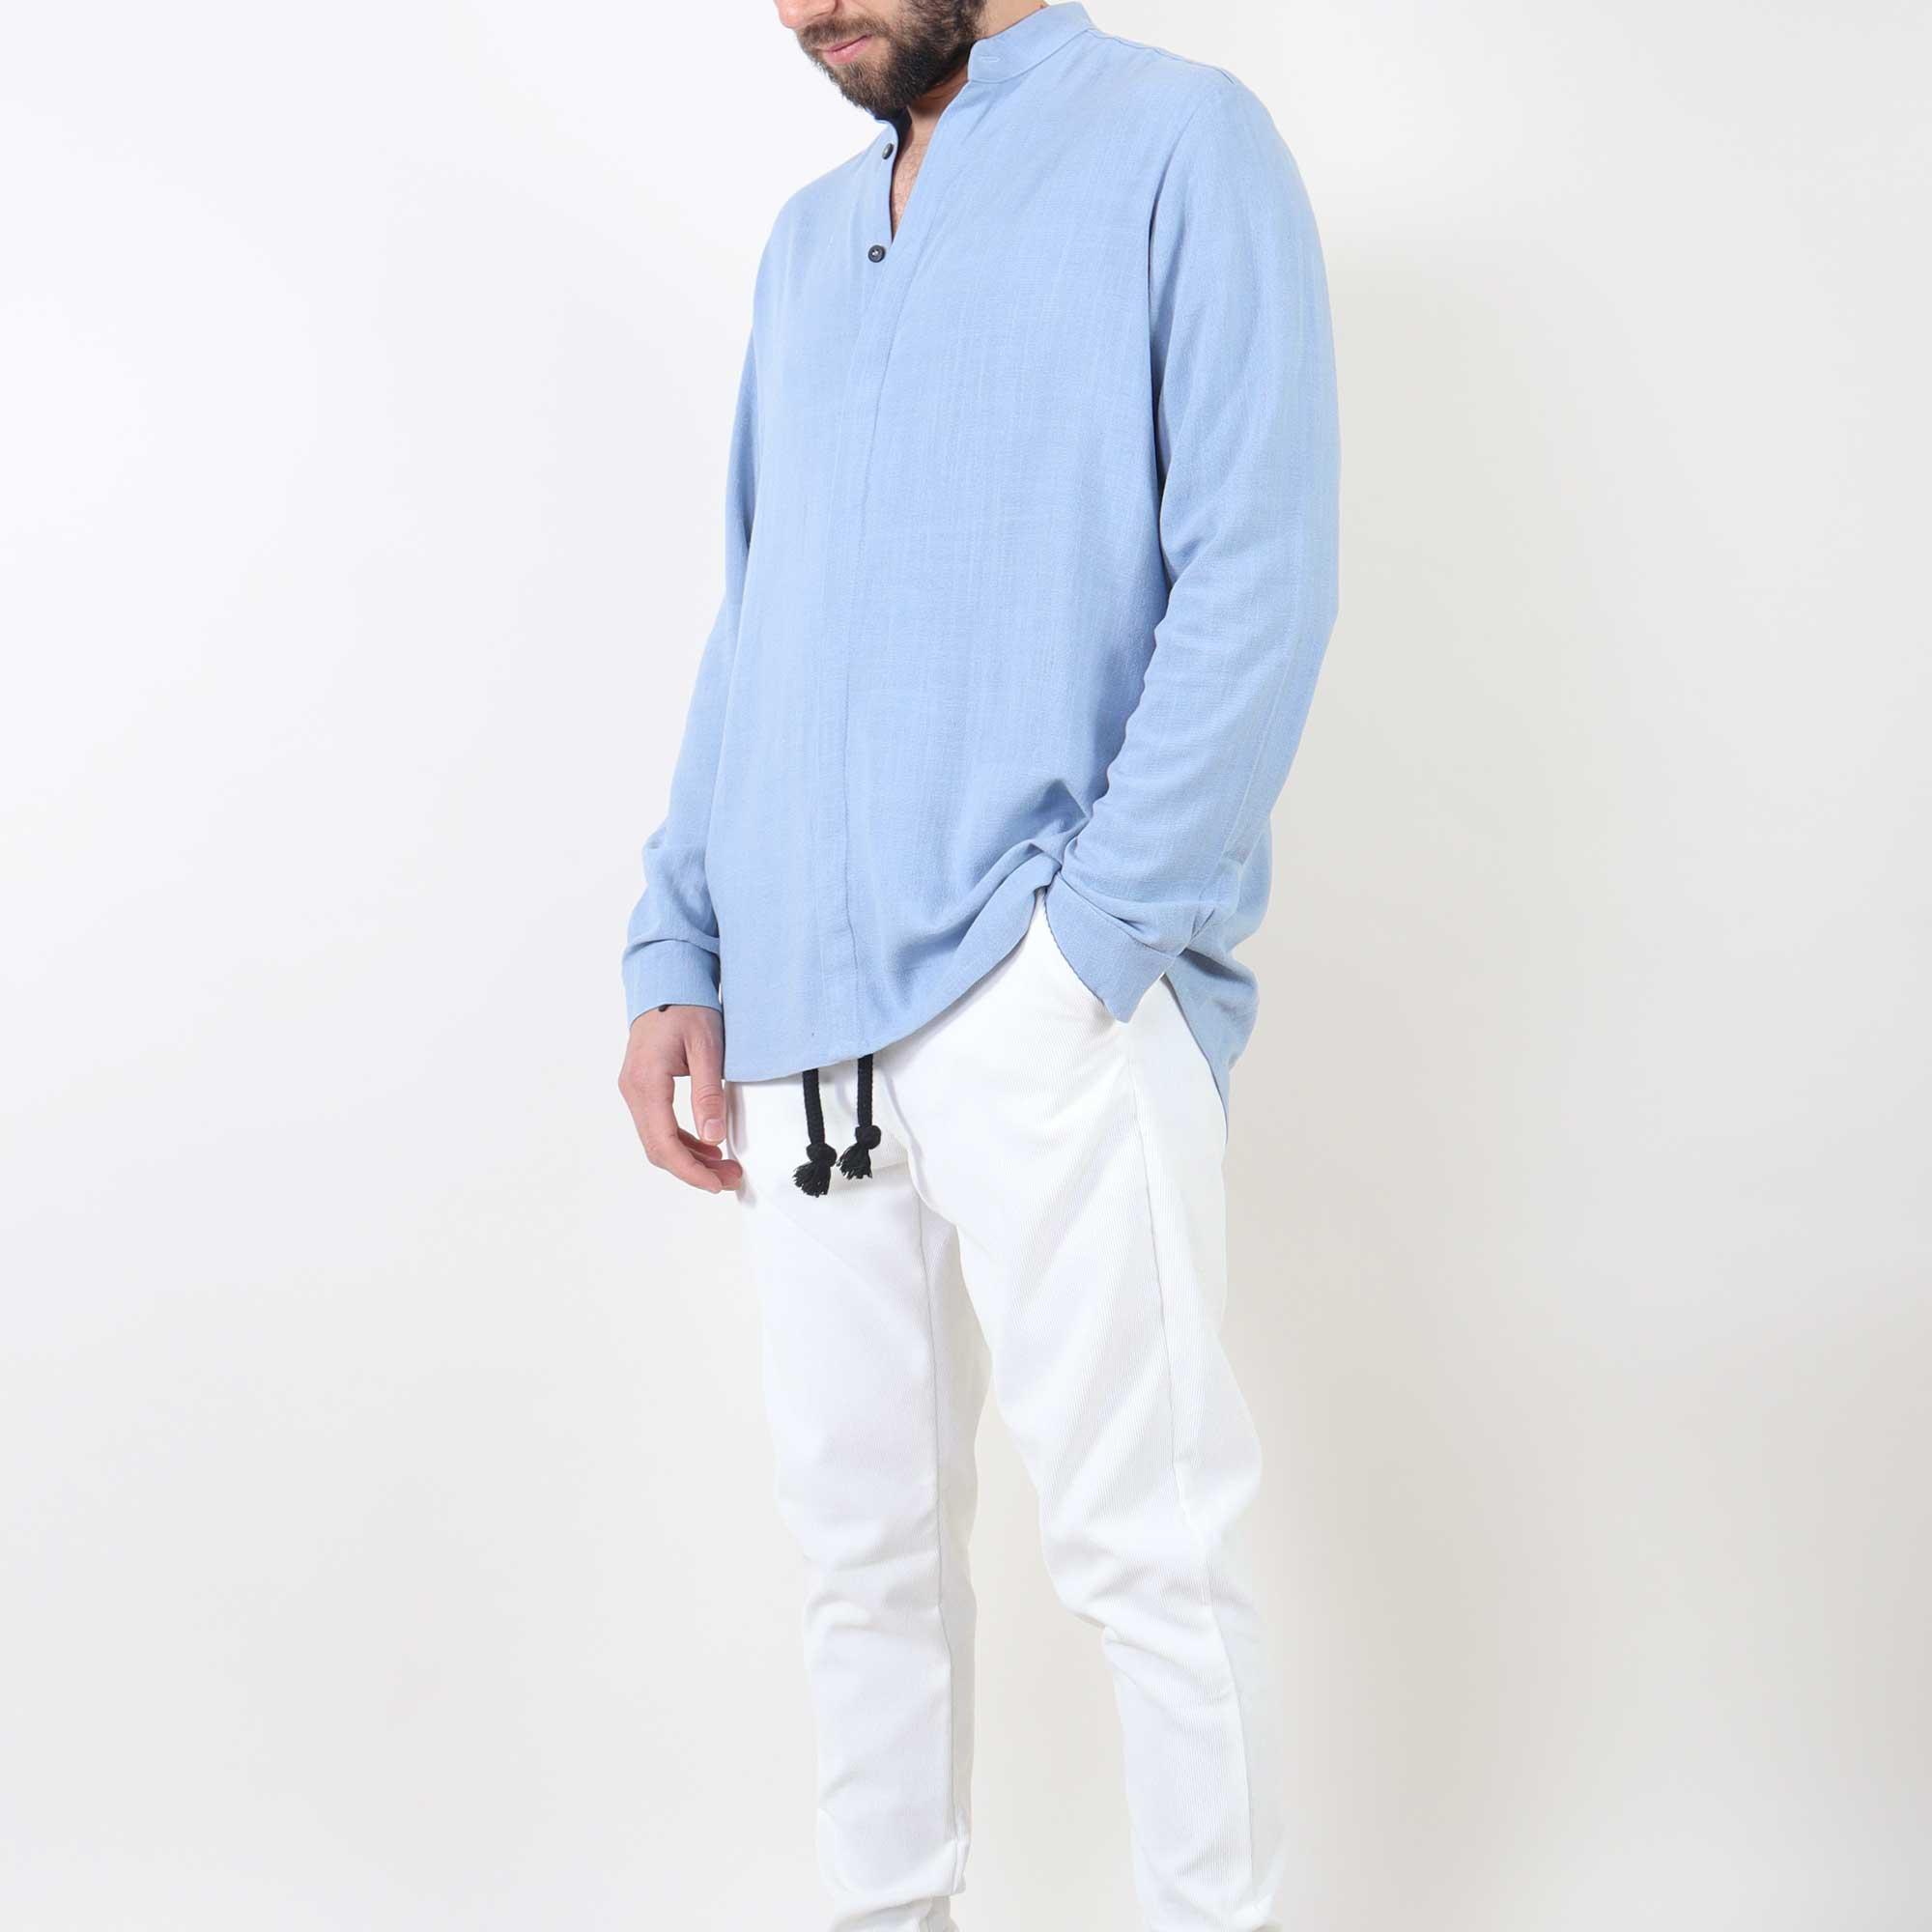 zippy-blauw-4